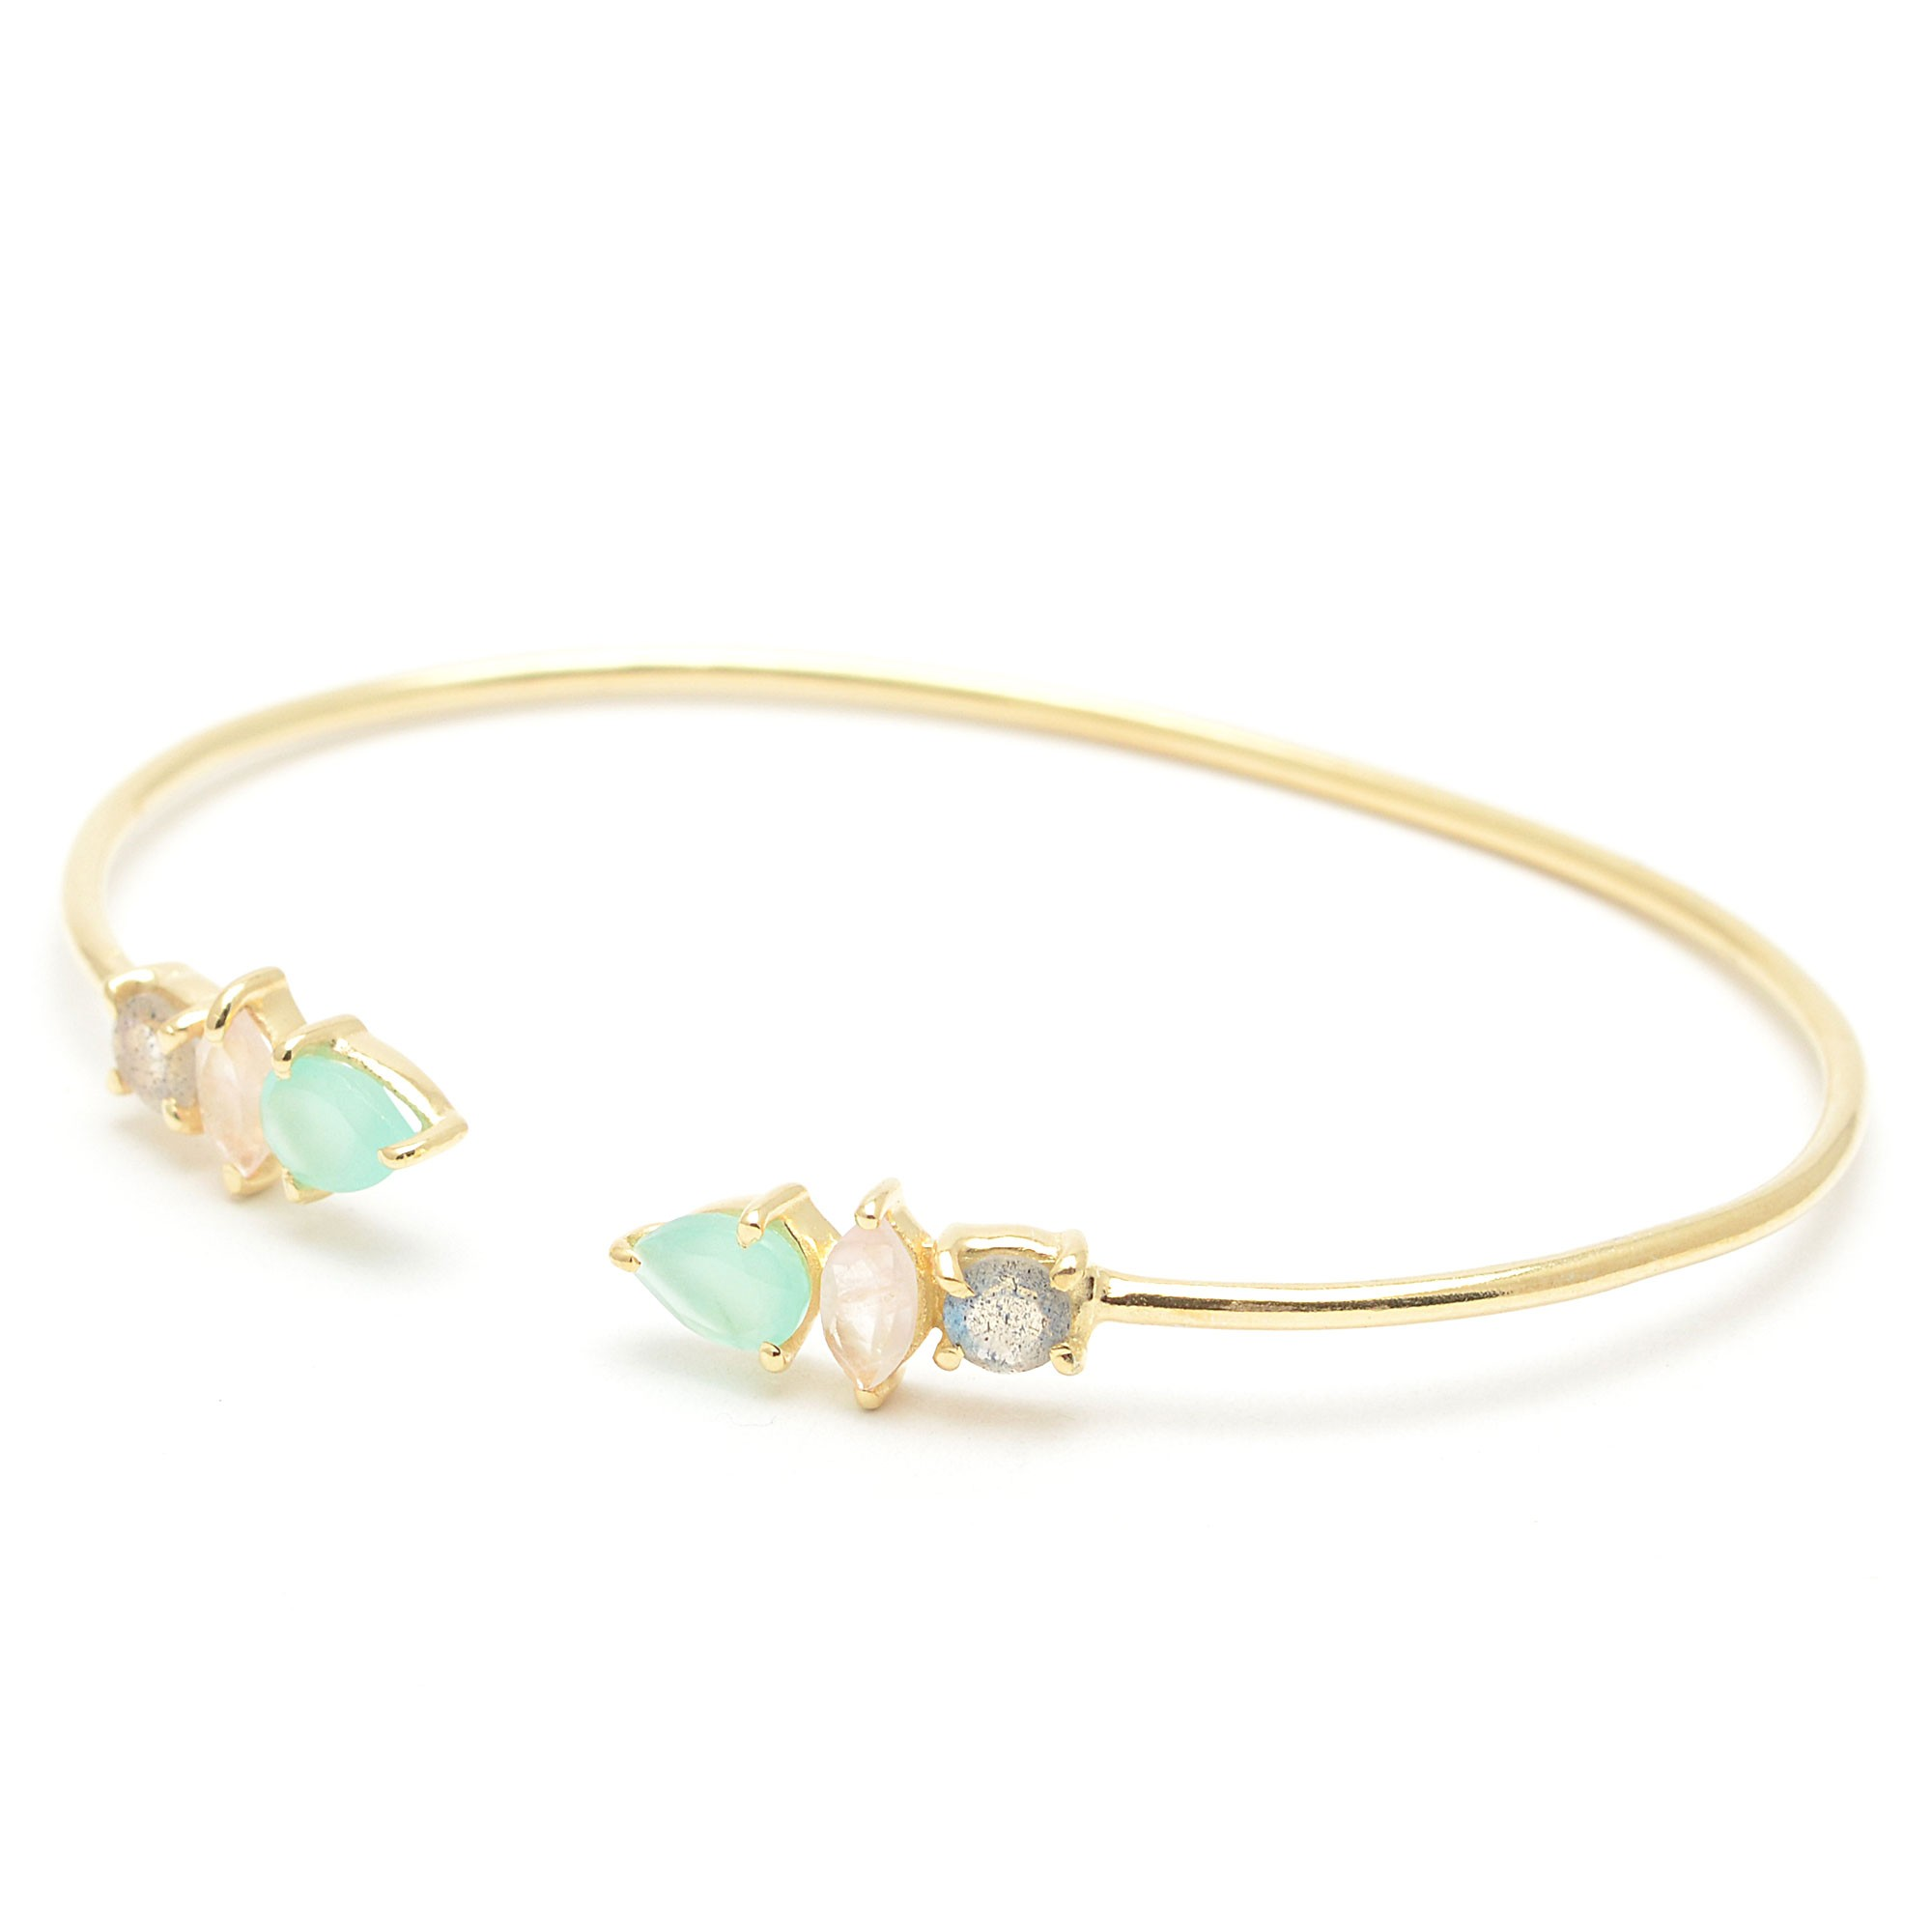 04599e0f2bb1 Brazalete dorado de plata con piedras verdes y rosa